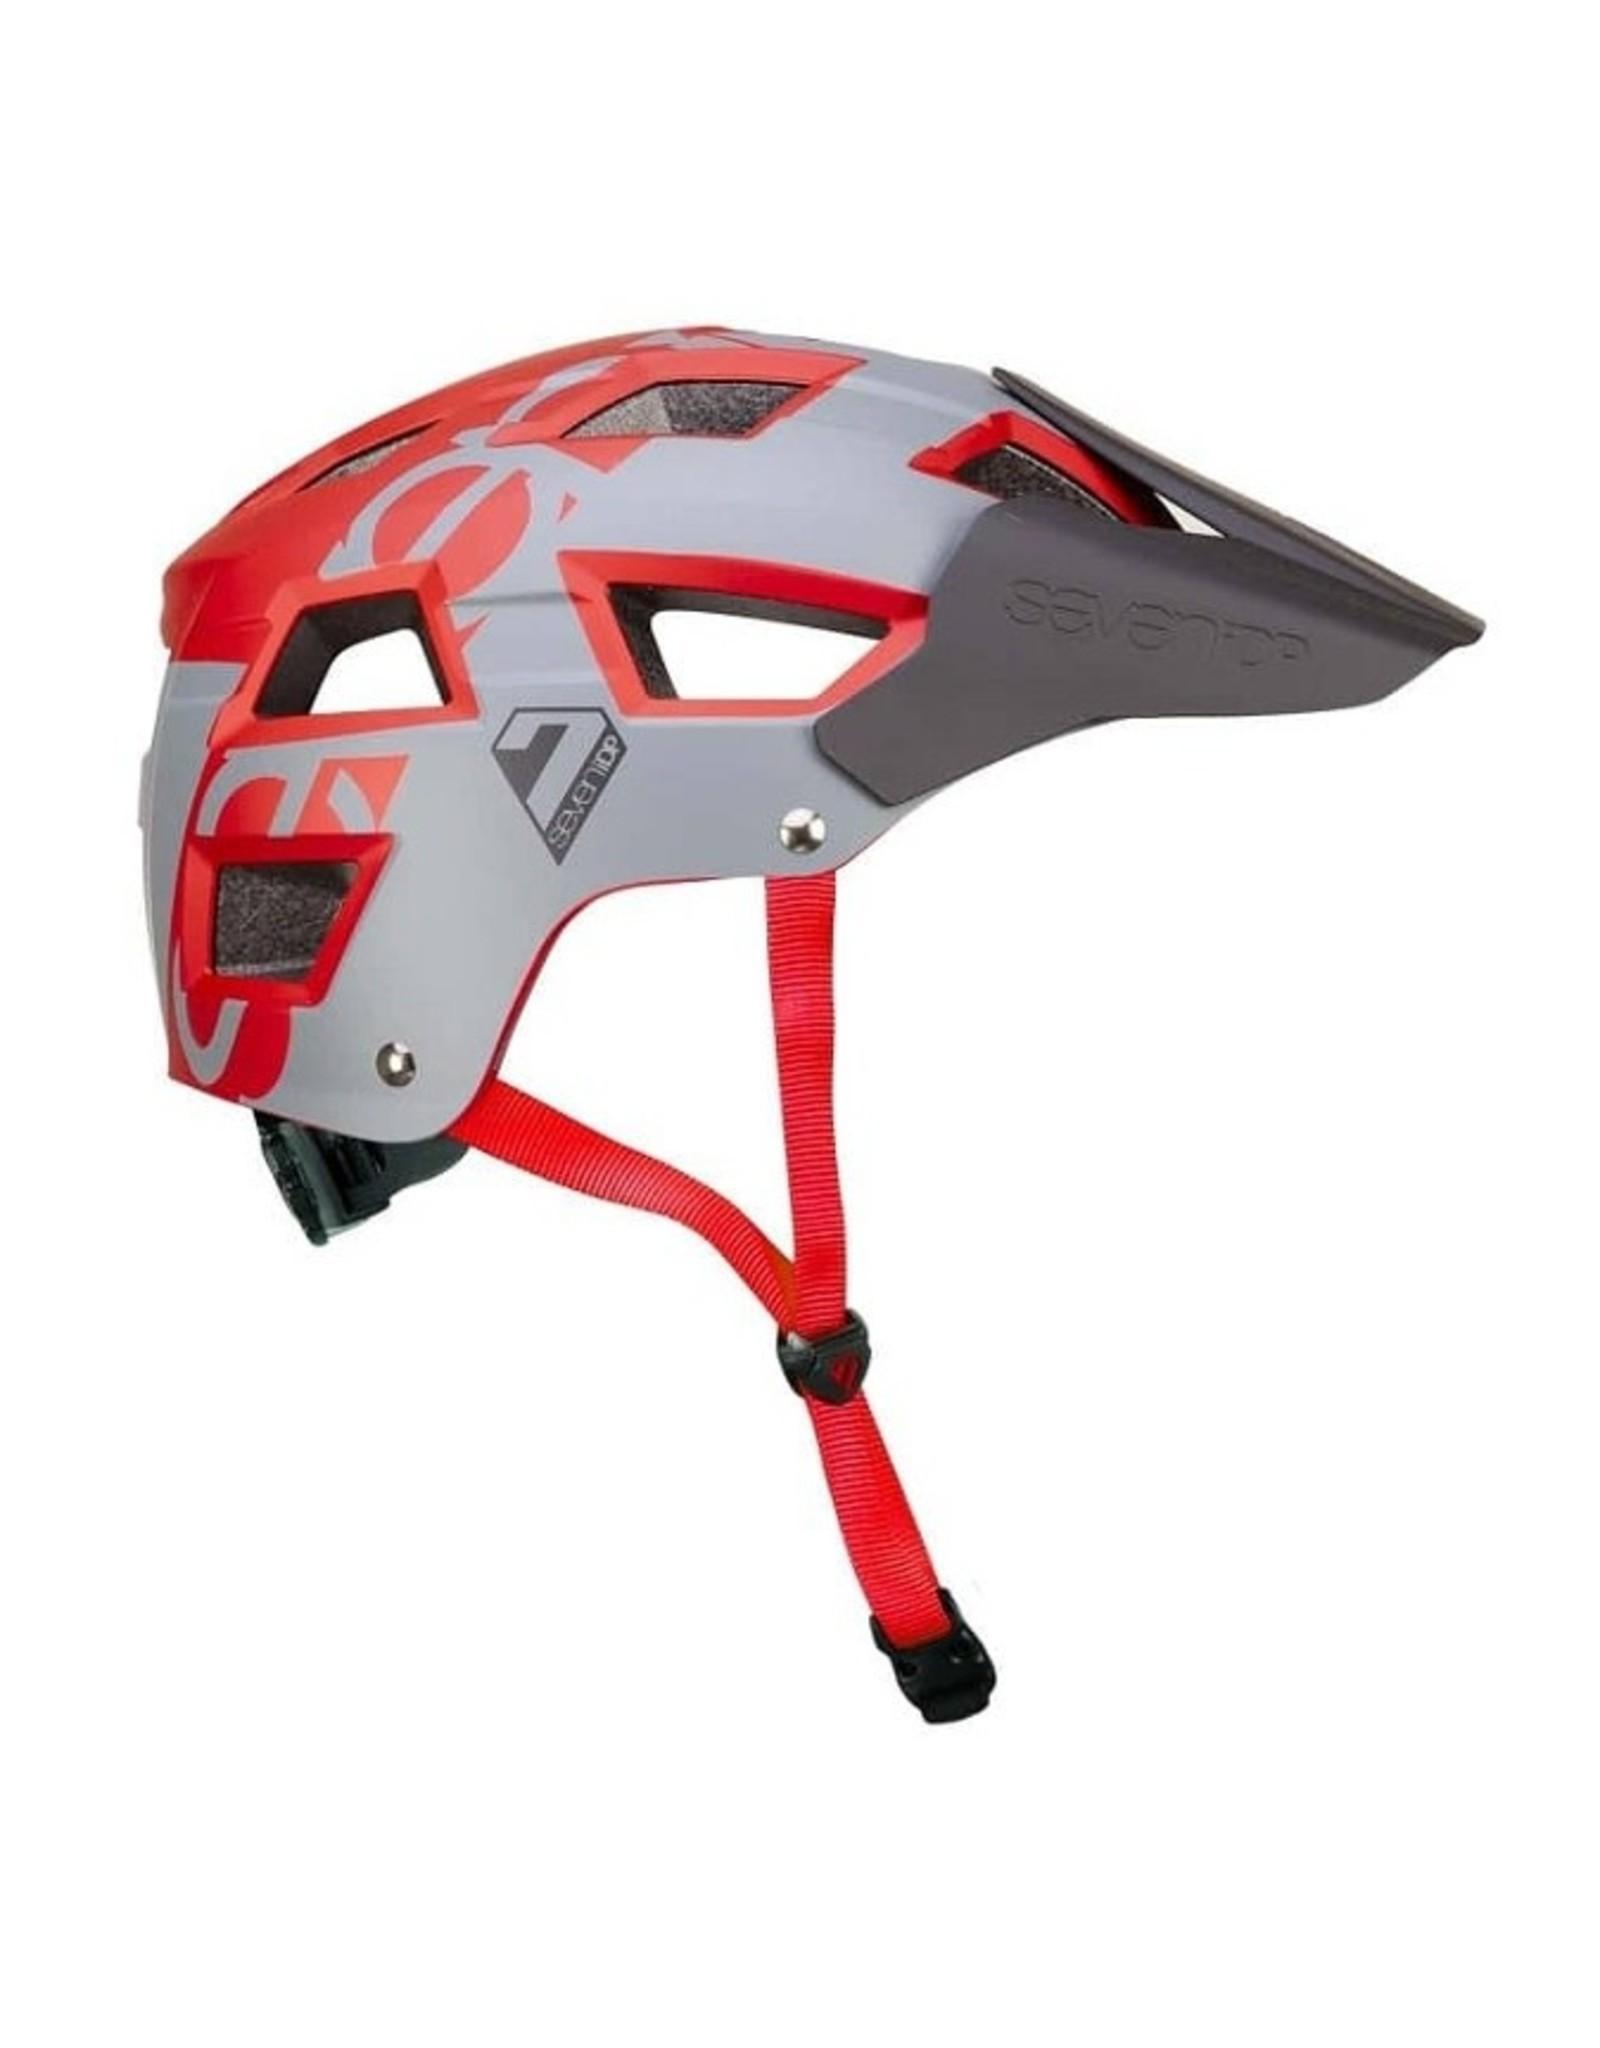 7iDP 7iDP, M5, Helmet, Grey/Metallic Dark Red, LXL, 58 - 62cm